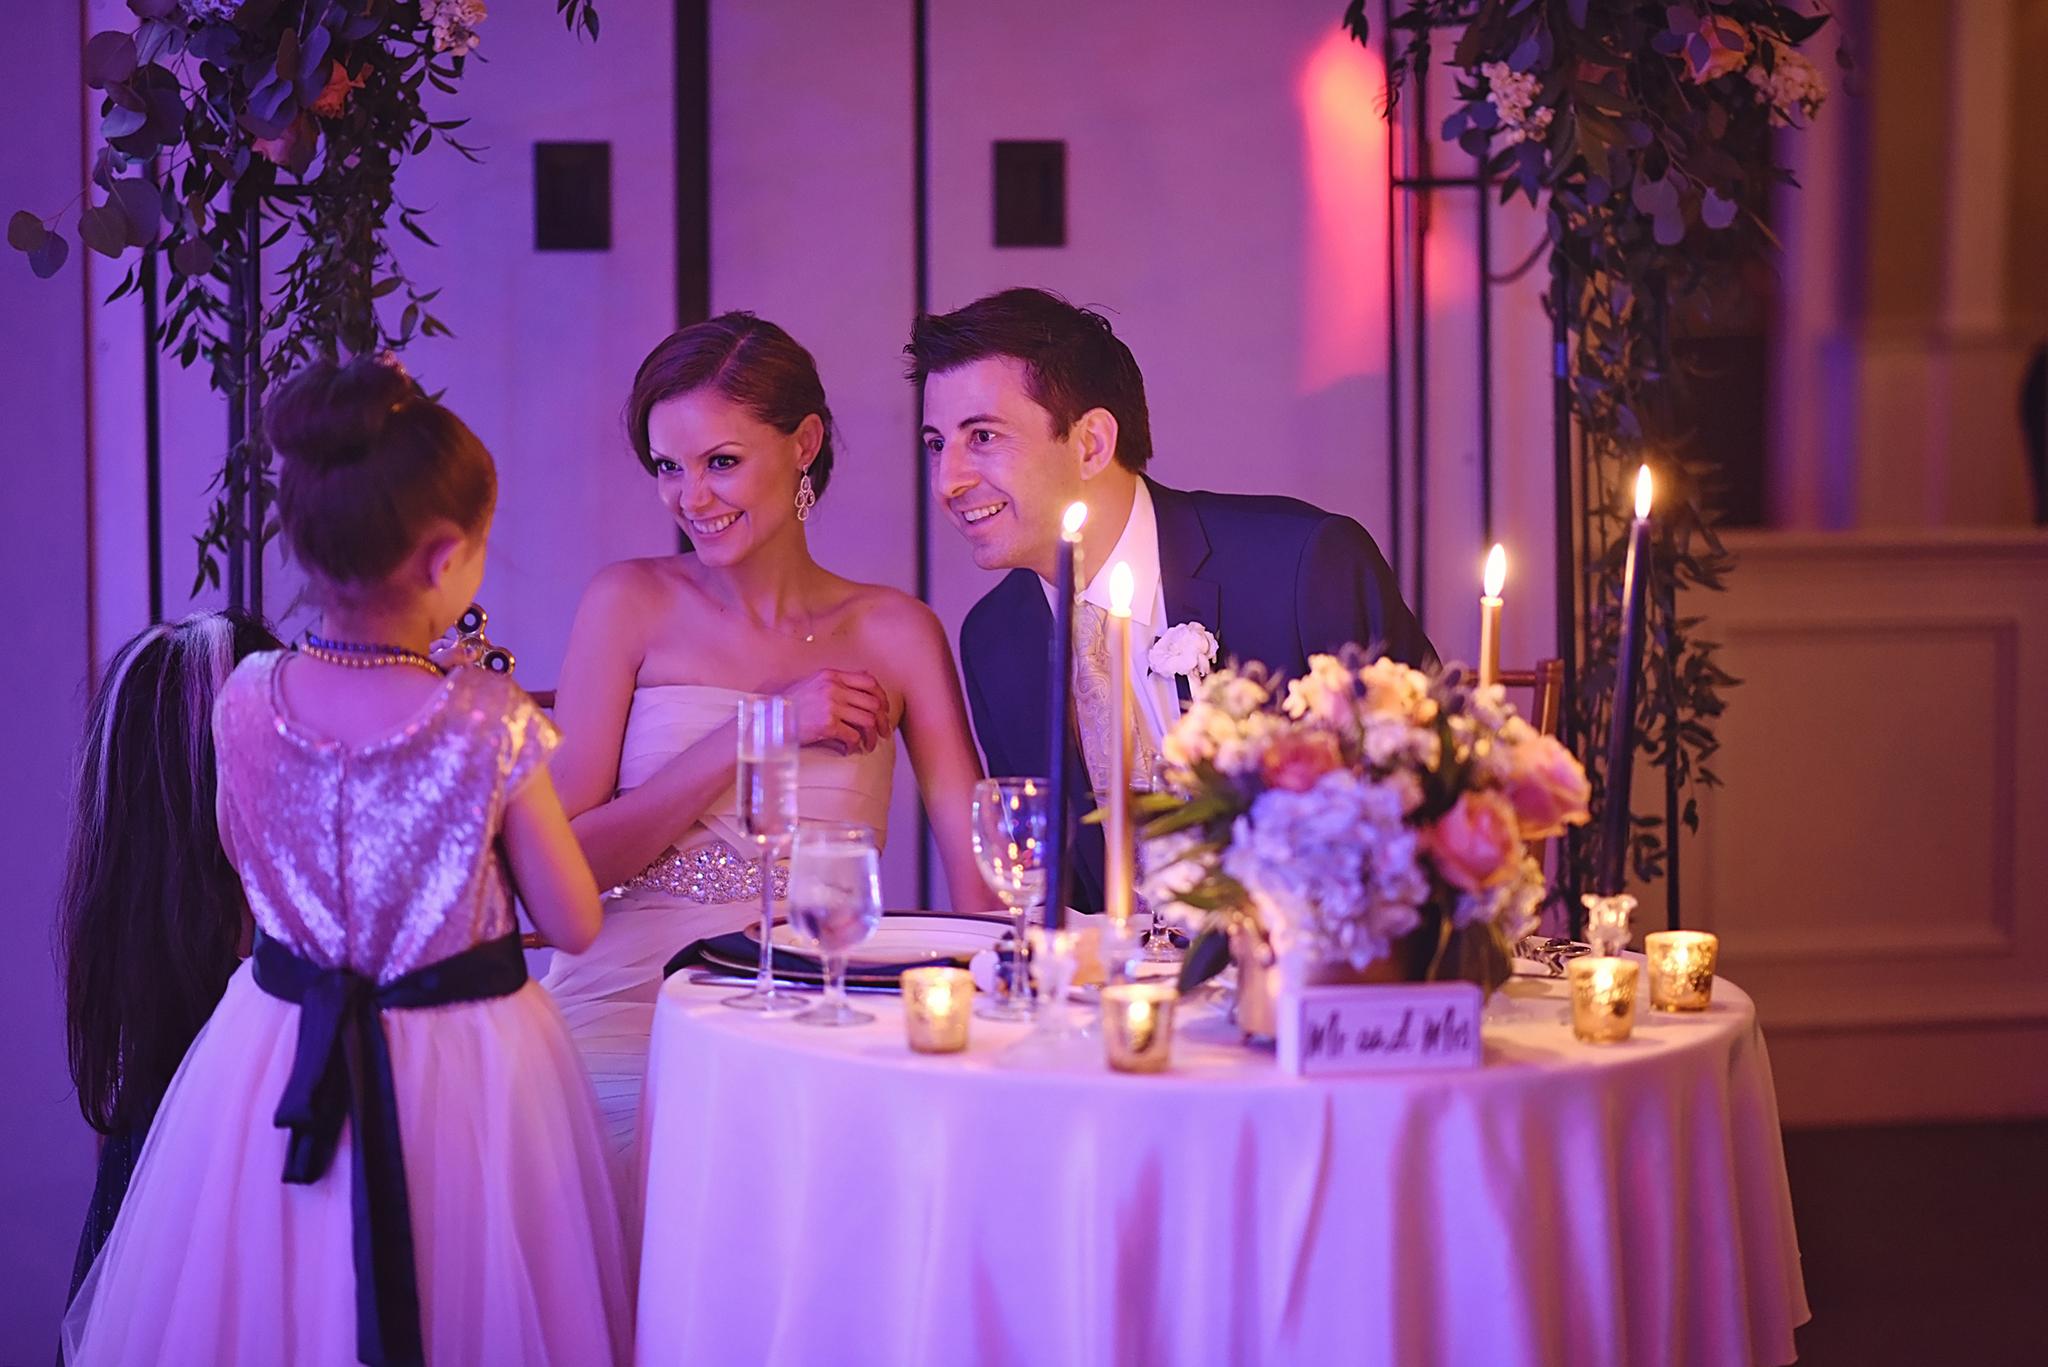 NJ-NY-wedding-photographer-149NJ-NY-wedding-photographer-149NJ-NY-WEDDING-PHOTOGRAPHER-149.JPG